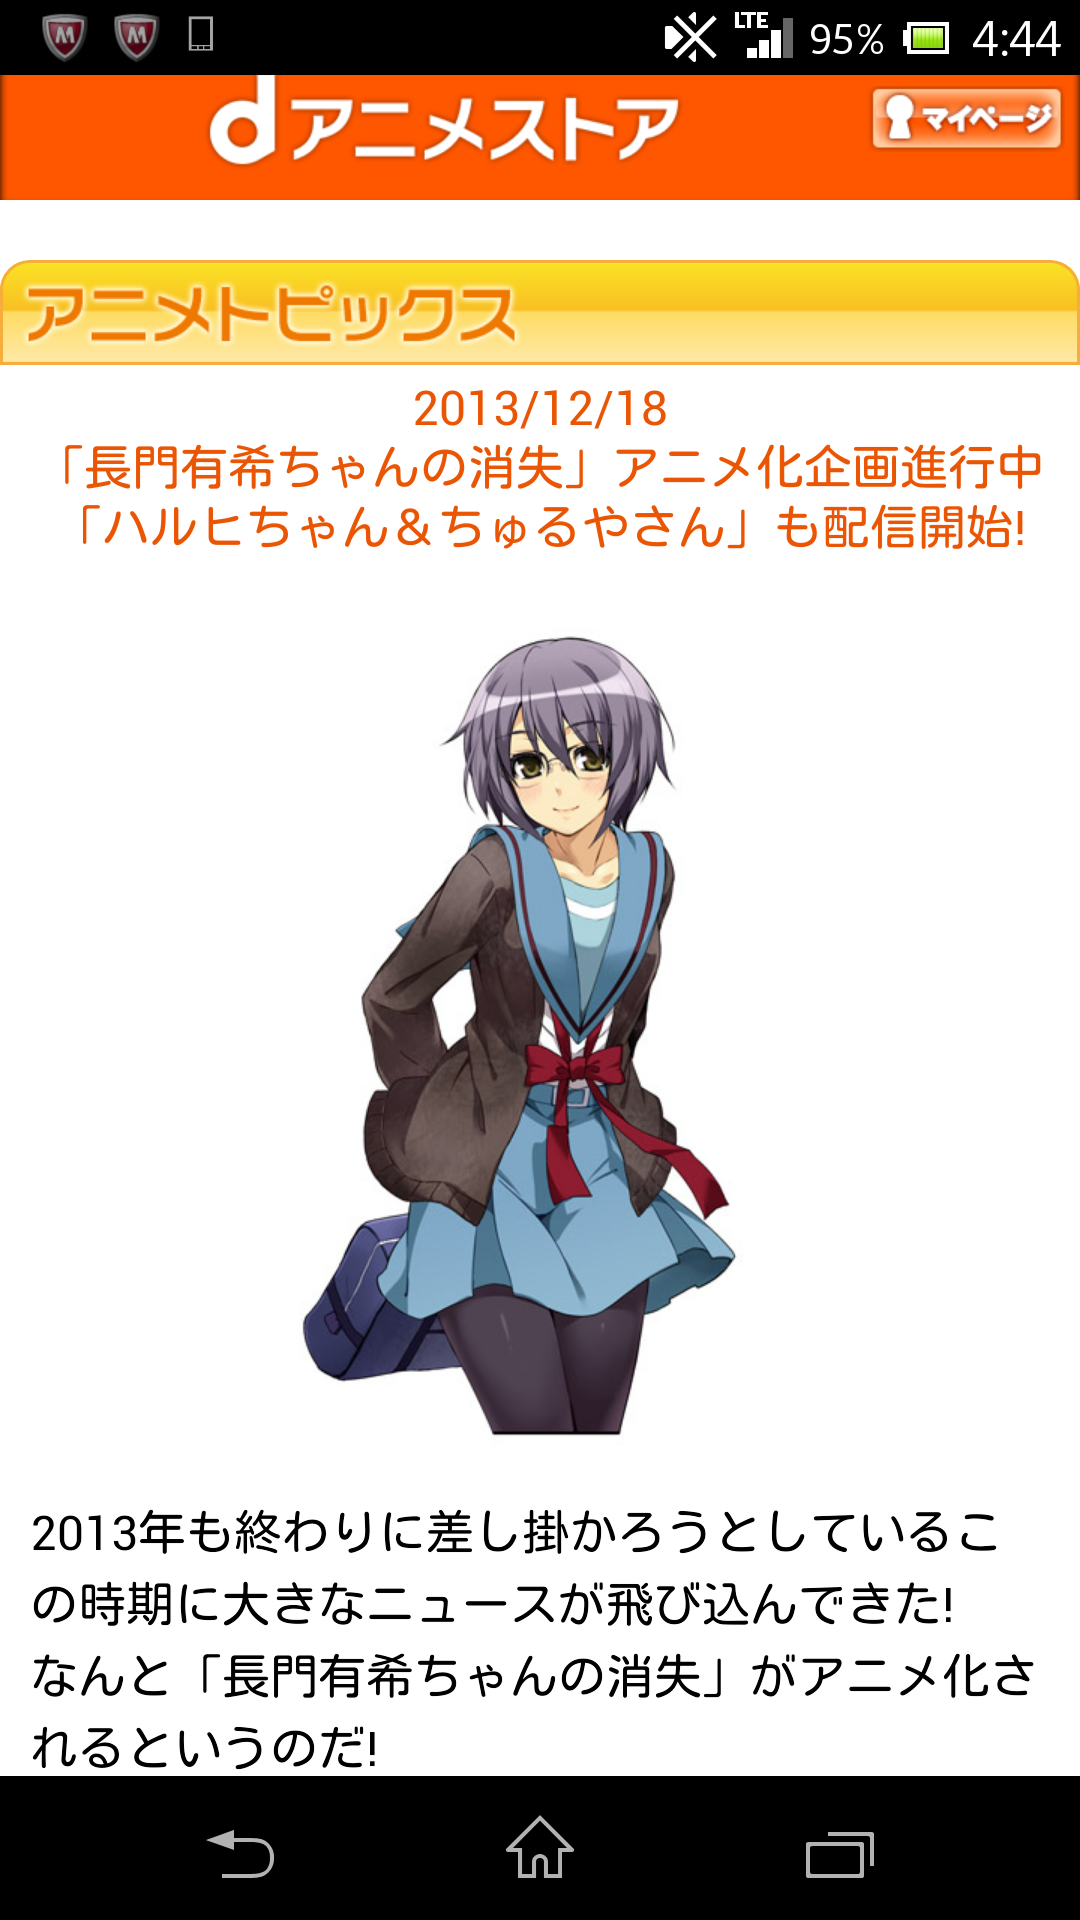 Yuki-chan-announcement